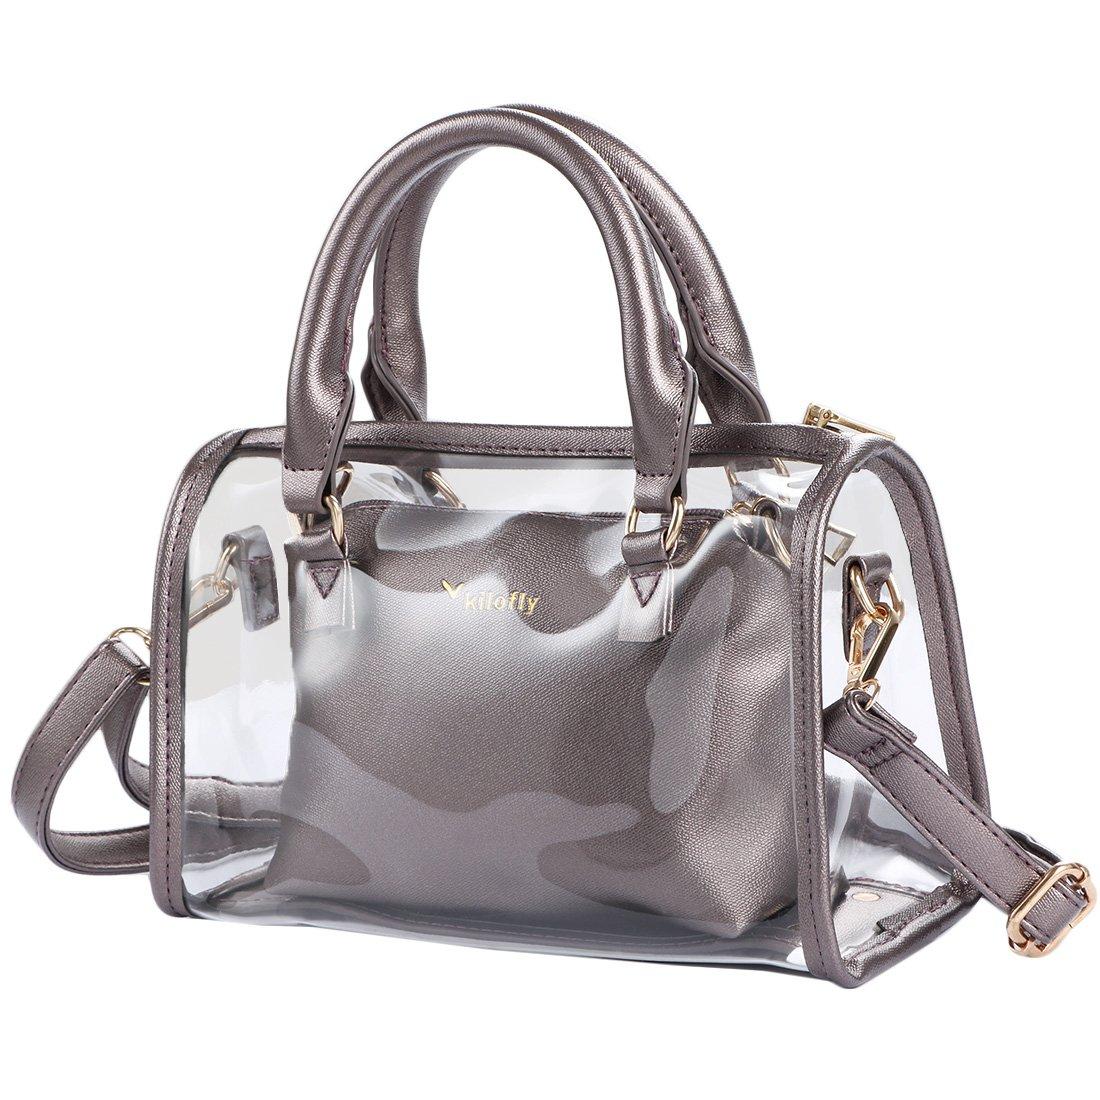 kilofly Women's 2-in-1 Clear Transparent Handbag Crossbody Purse Shoulder Bag AWP390BLK